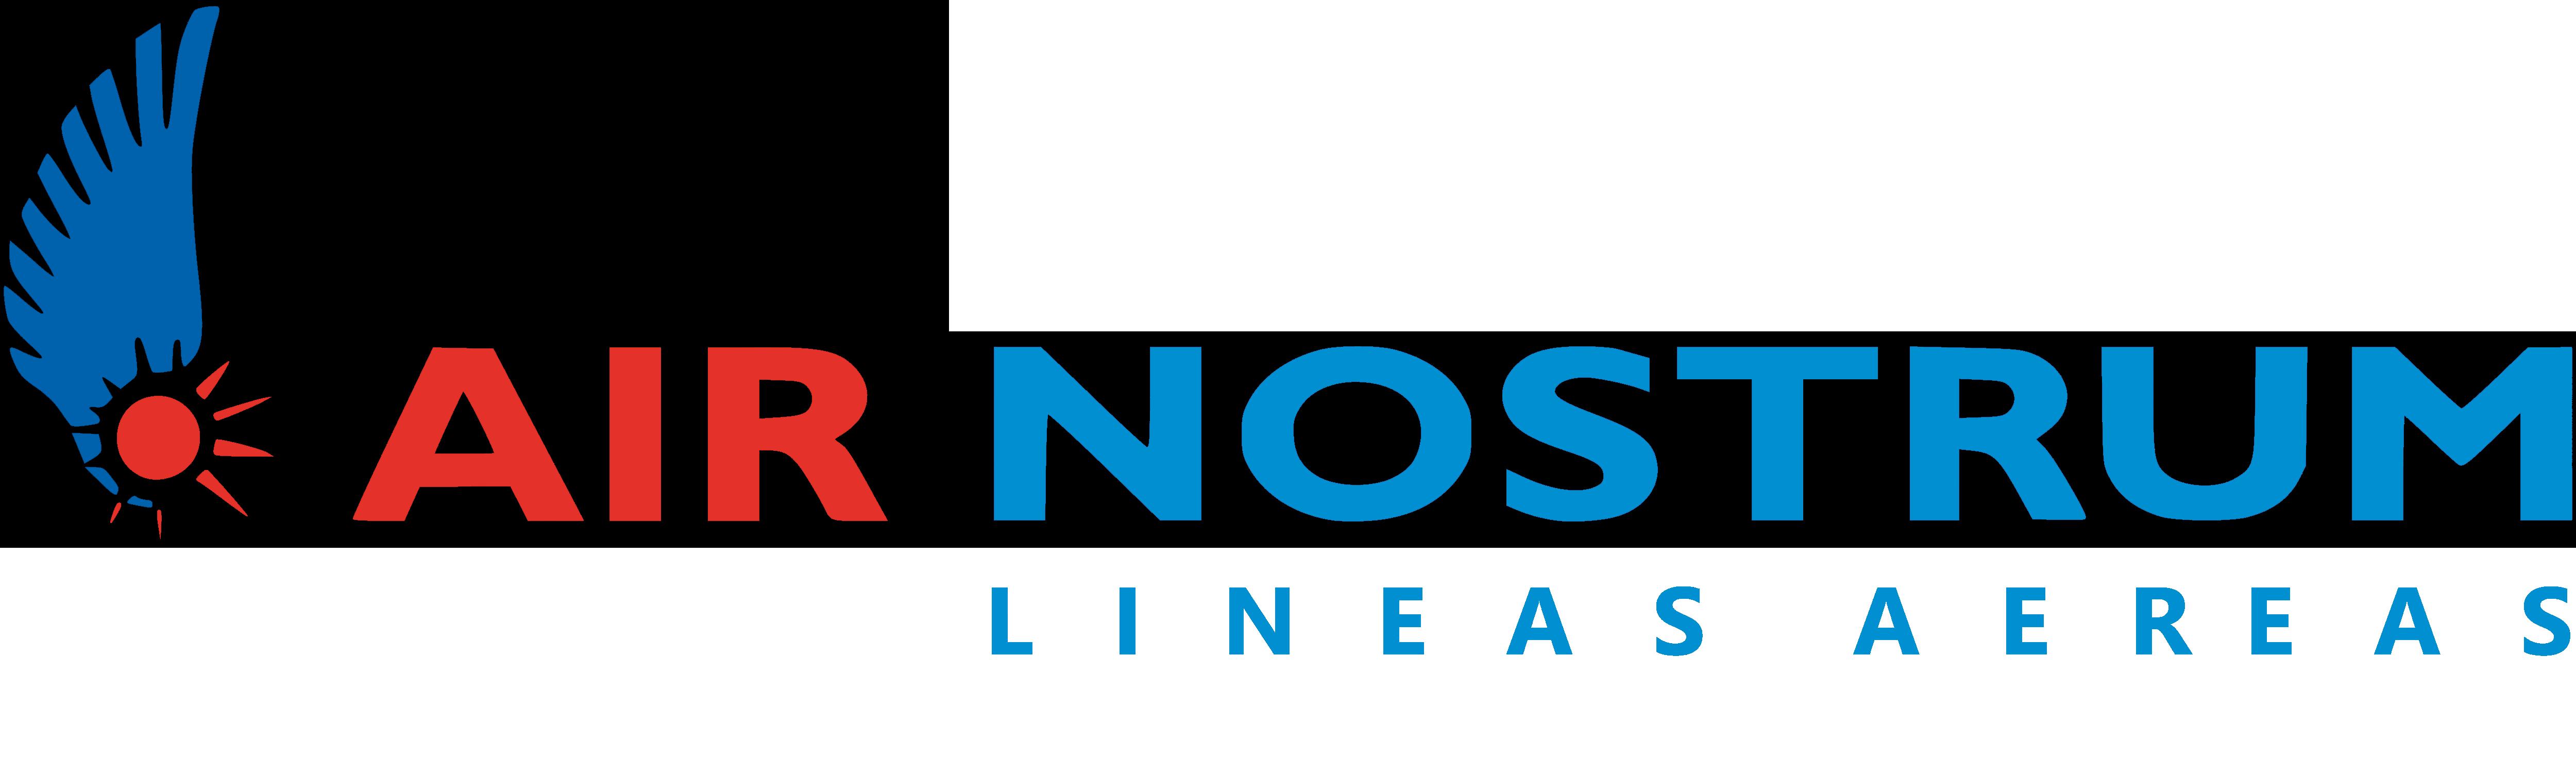 Air_Nostrum_logotype_logo_emblem_2.png